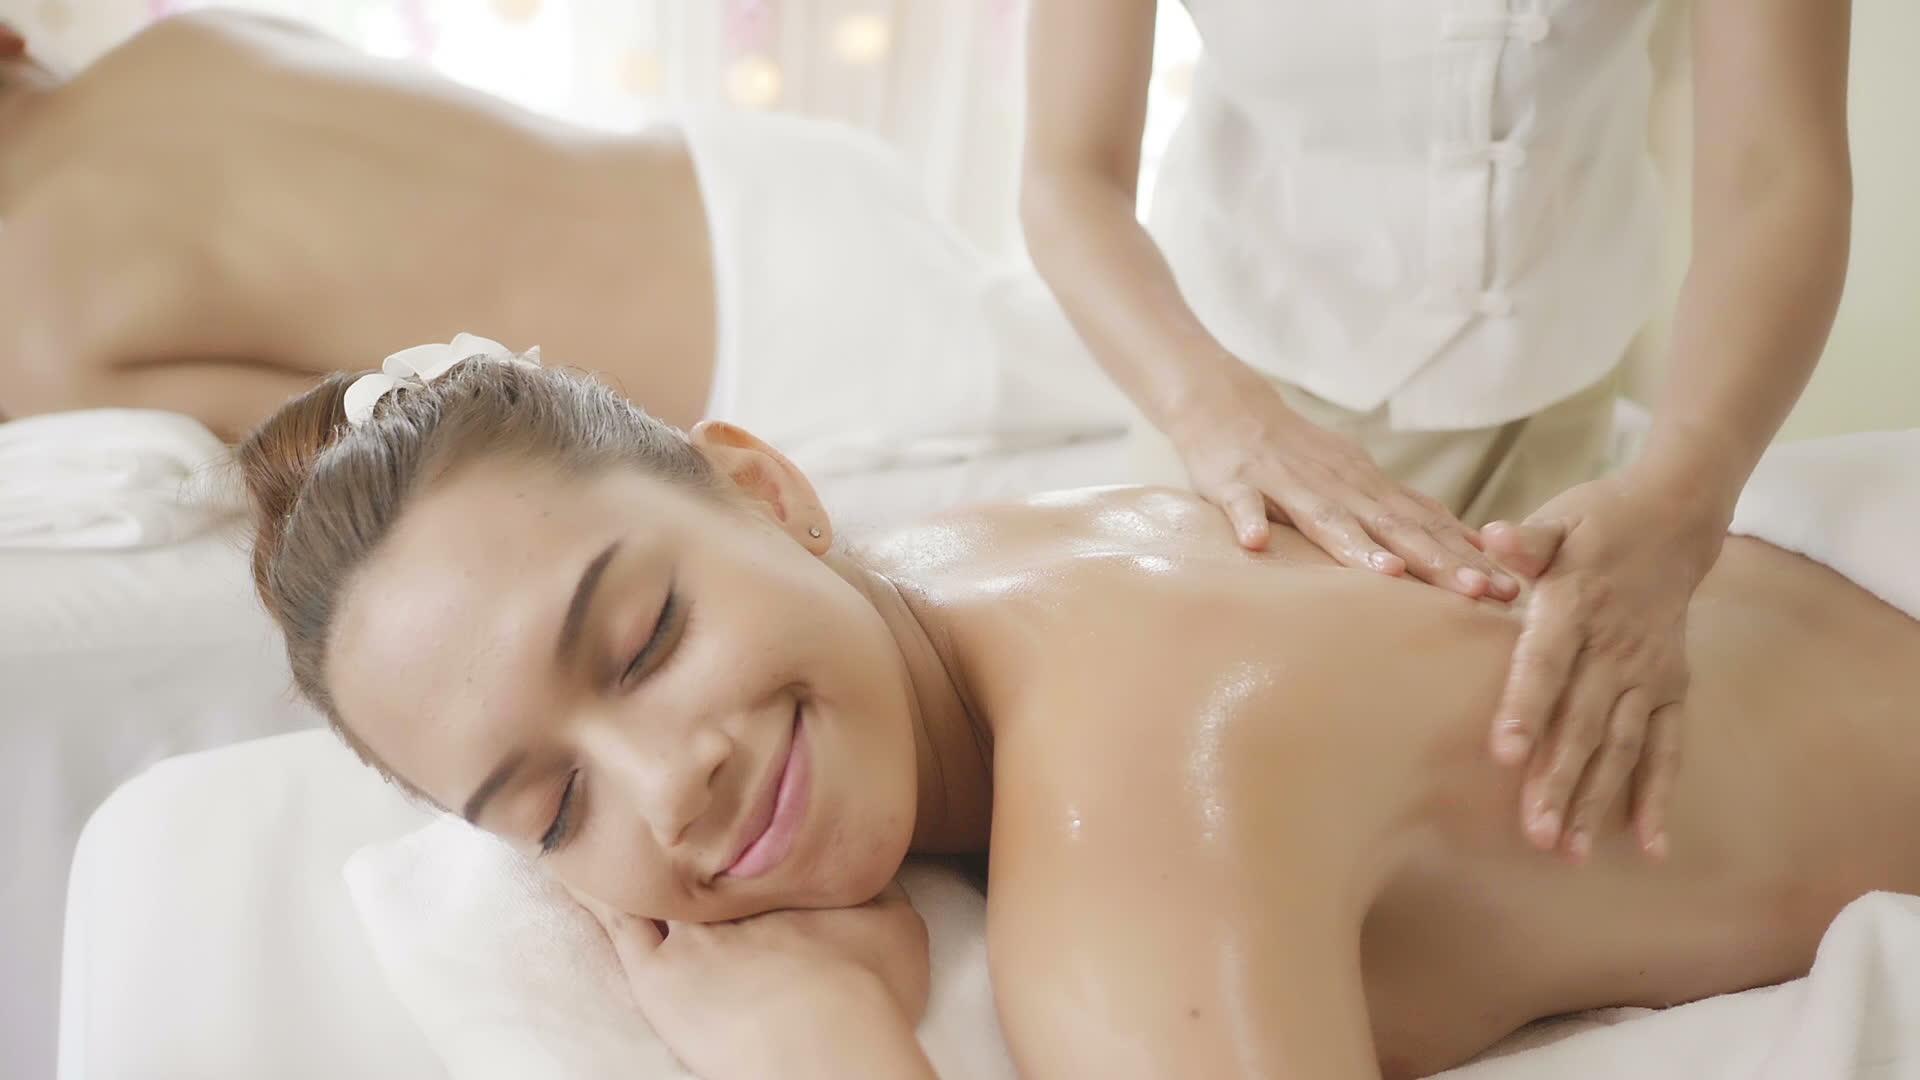 Video massage free Sexual Misconduct